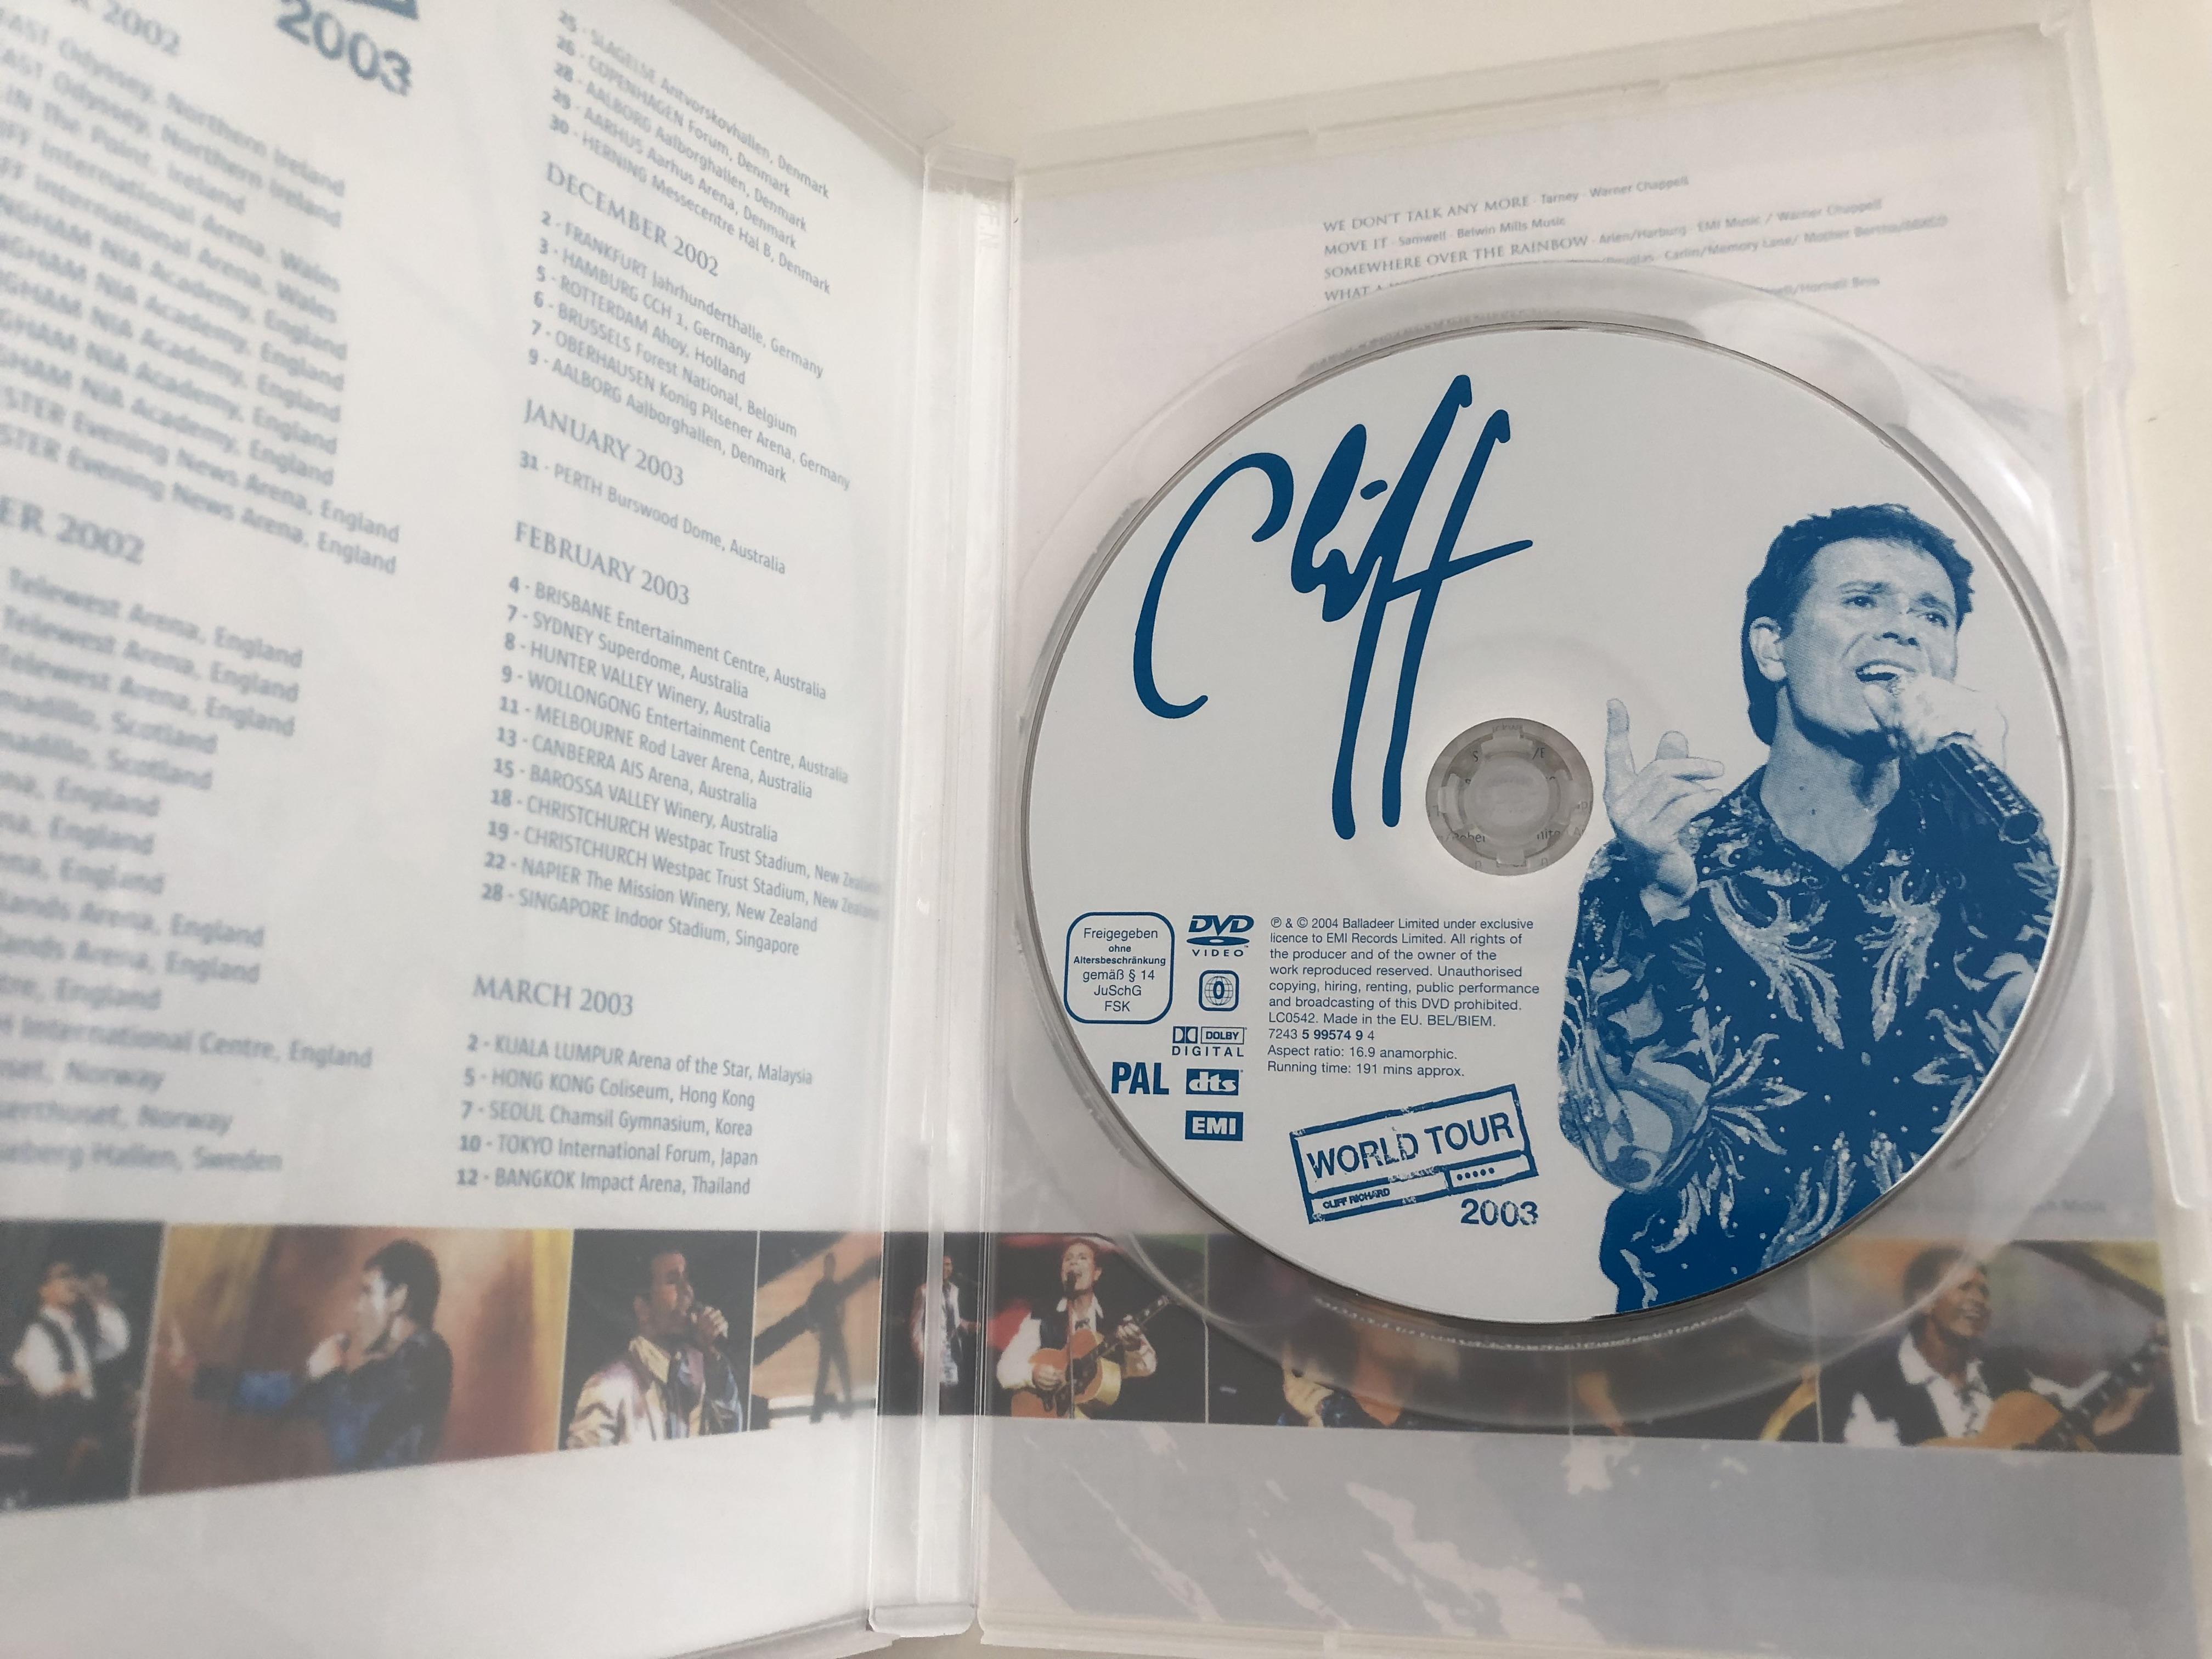 cliff-richard-2003-world-tour-dvd-2004-concert-director-ian-hamilton-2-.jpg